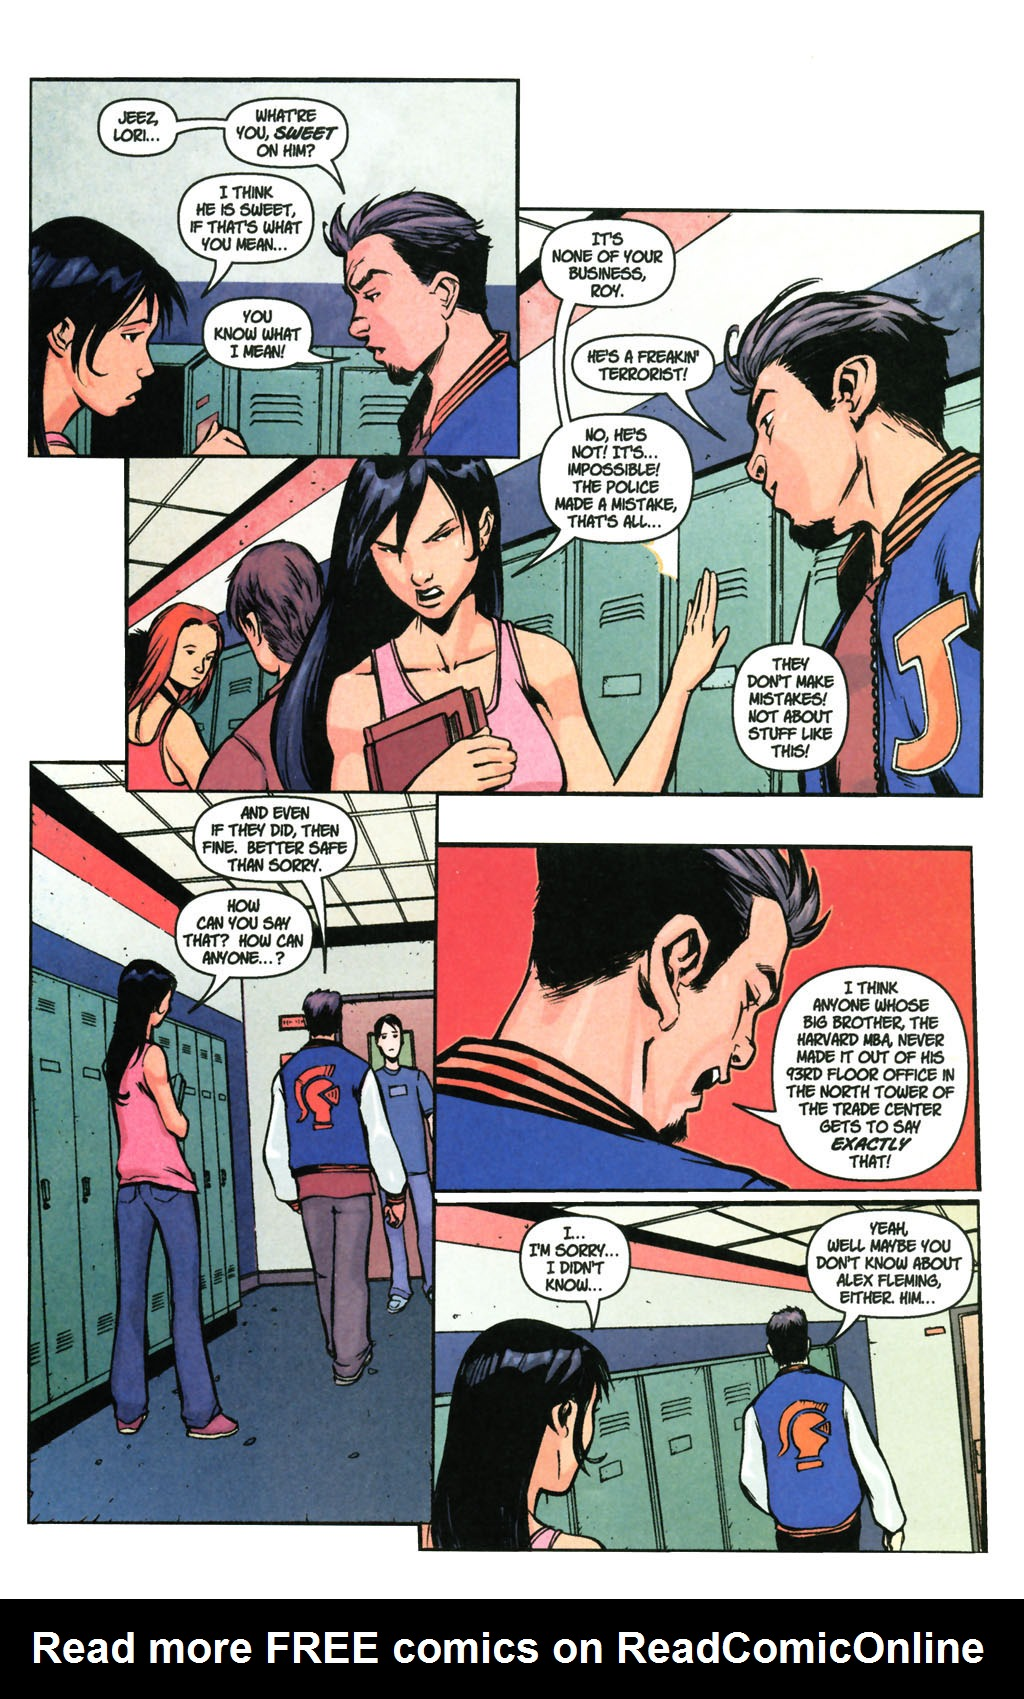 Read online SpyBoy: Final Exam comic -  Issue #3 - 19